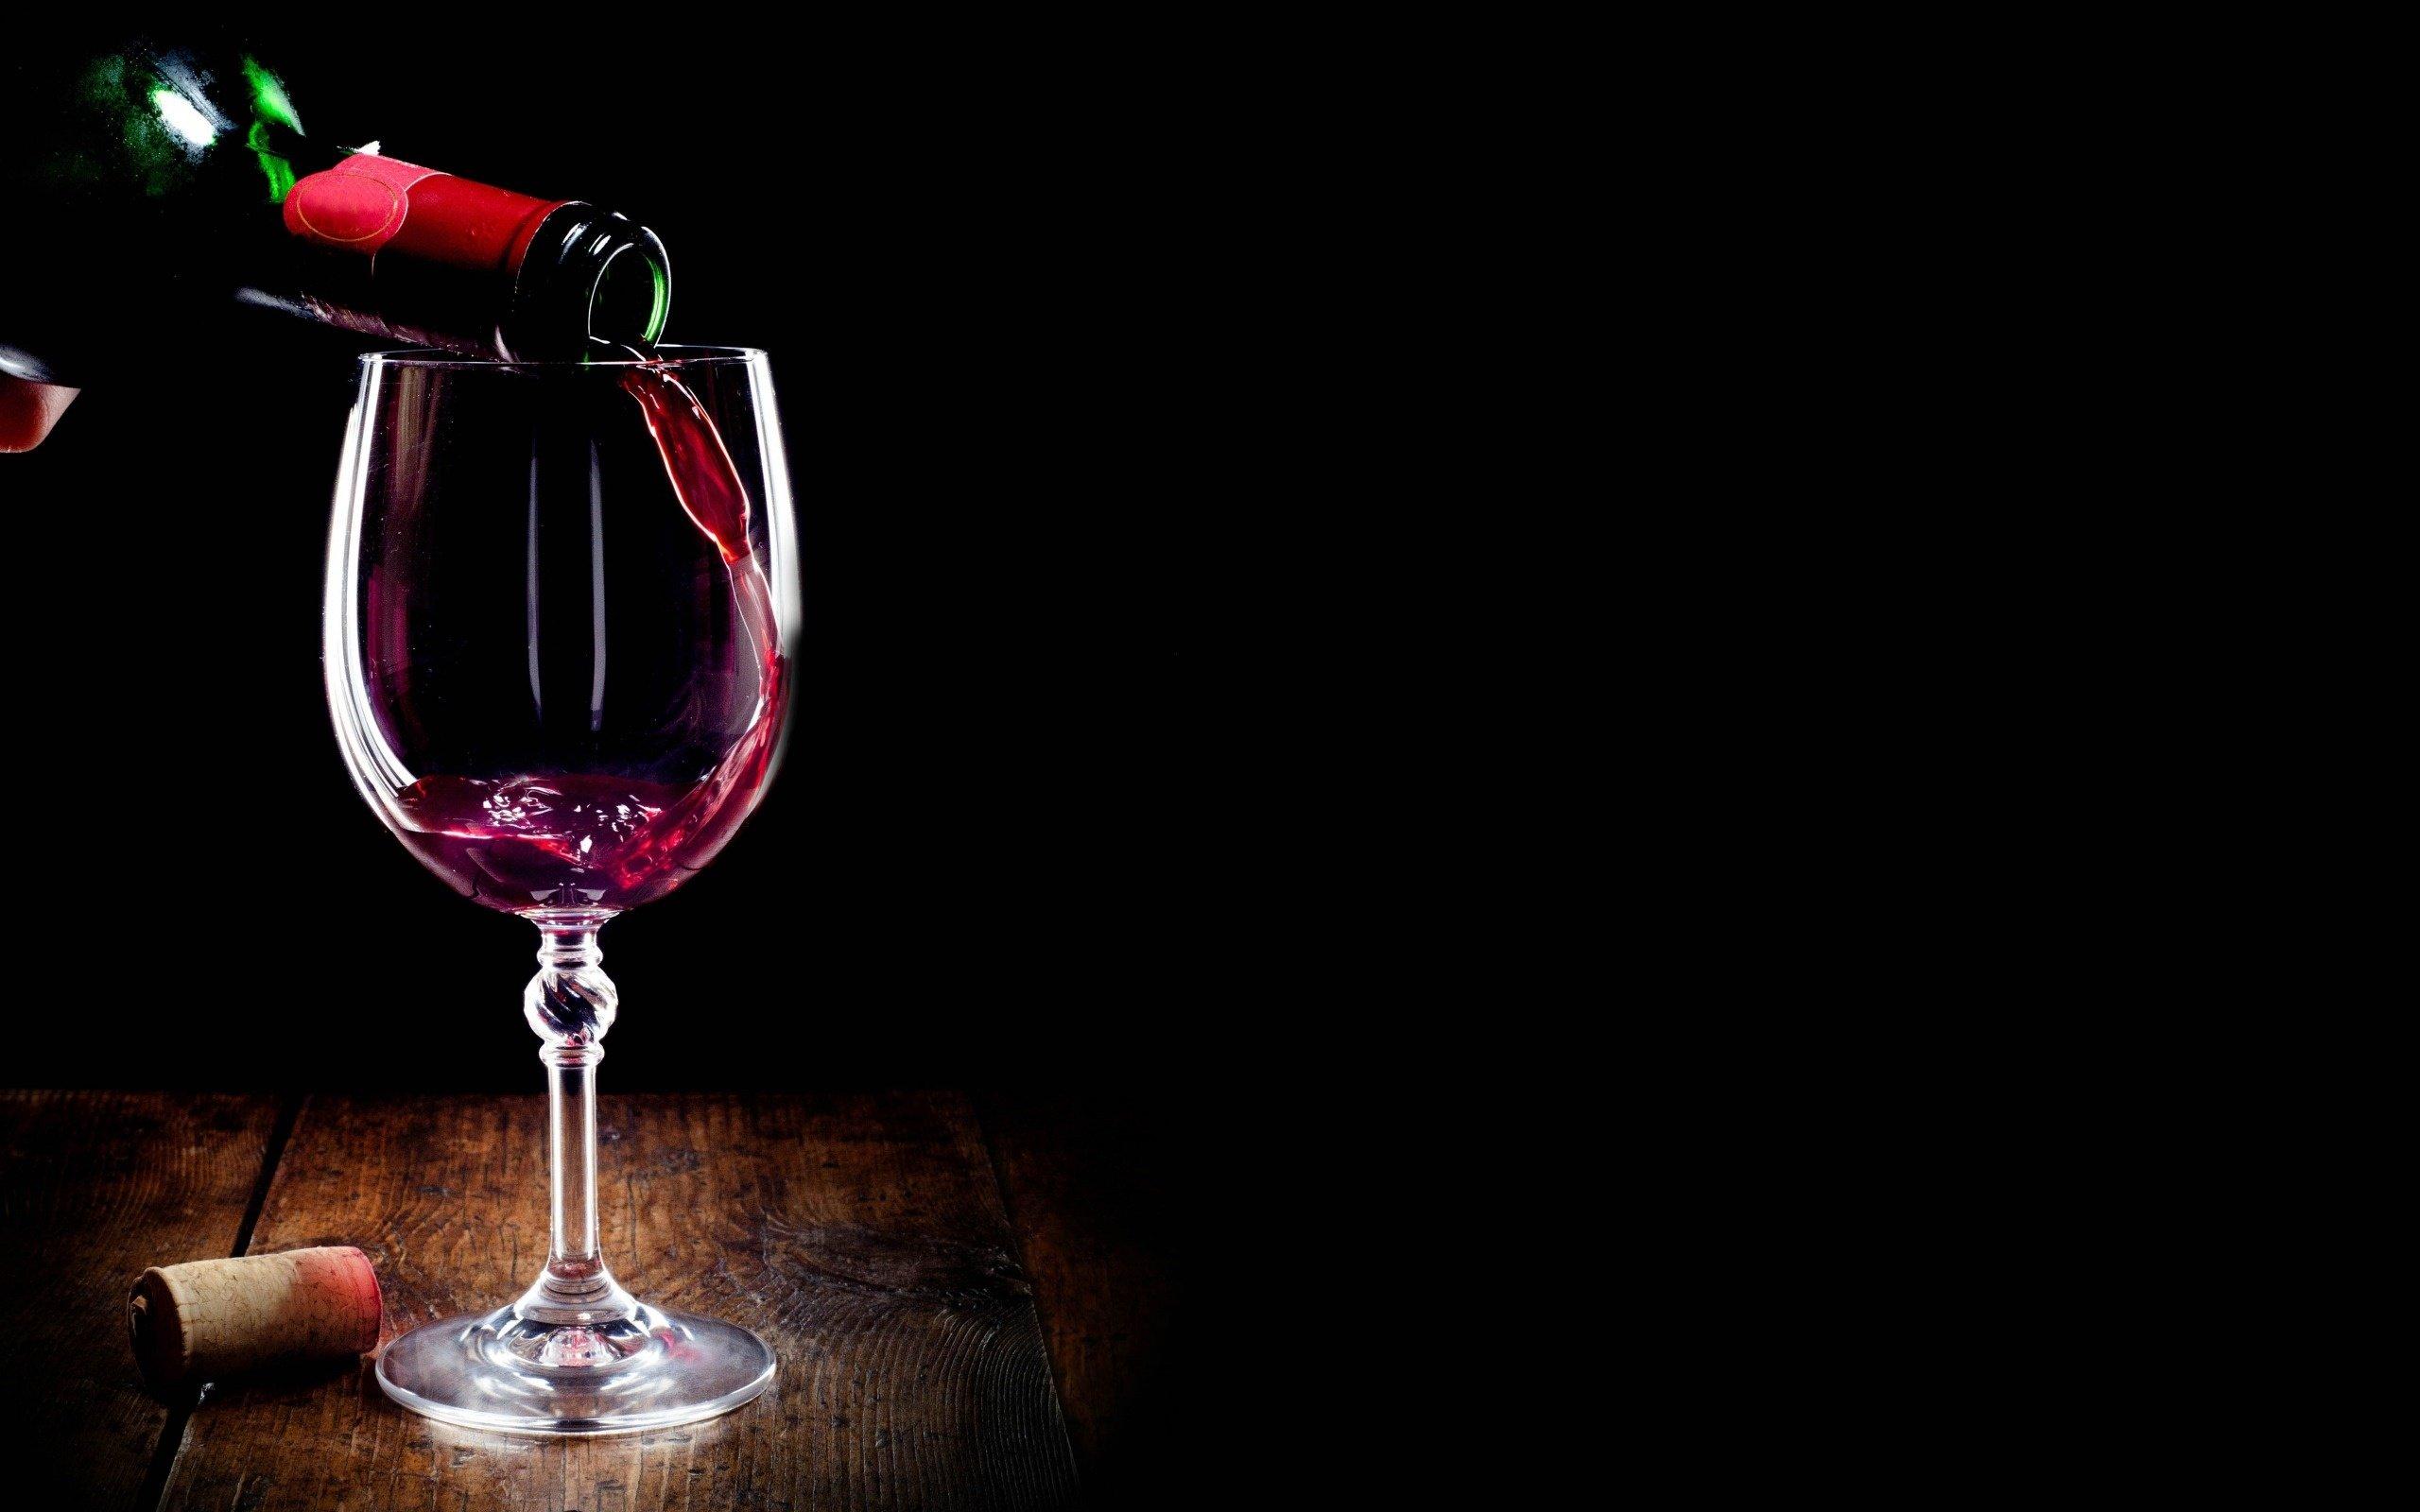 glass of wine alcohol wallpaper 2560x1600 848773 wallpaperup. Black Bedroom Furniture Sets. Home Design Ideas